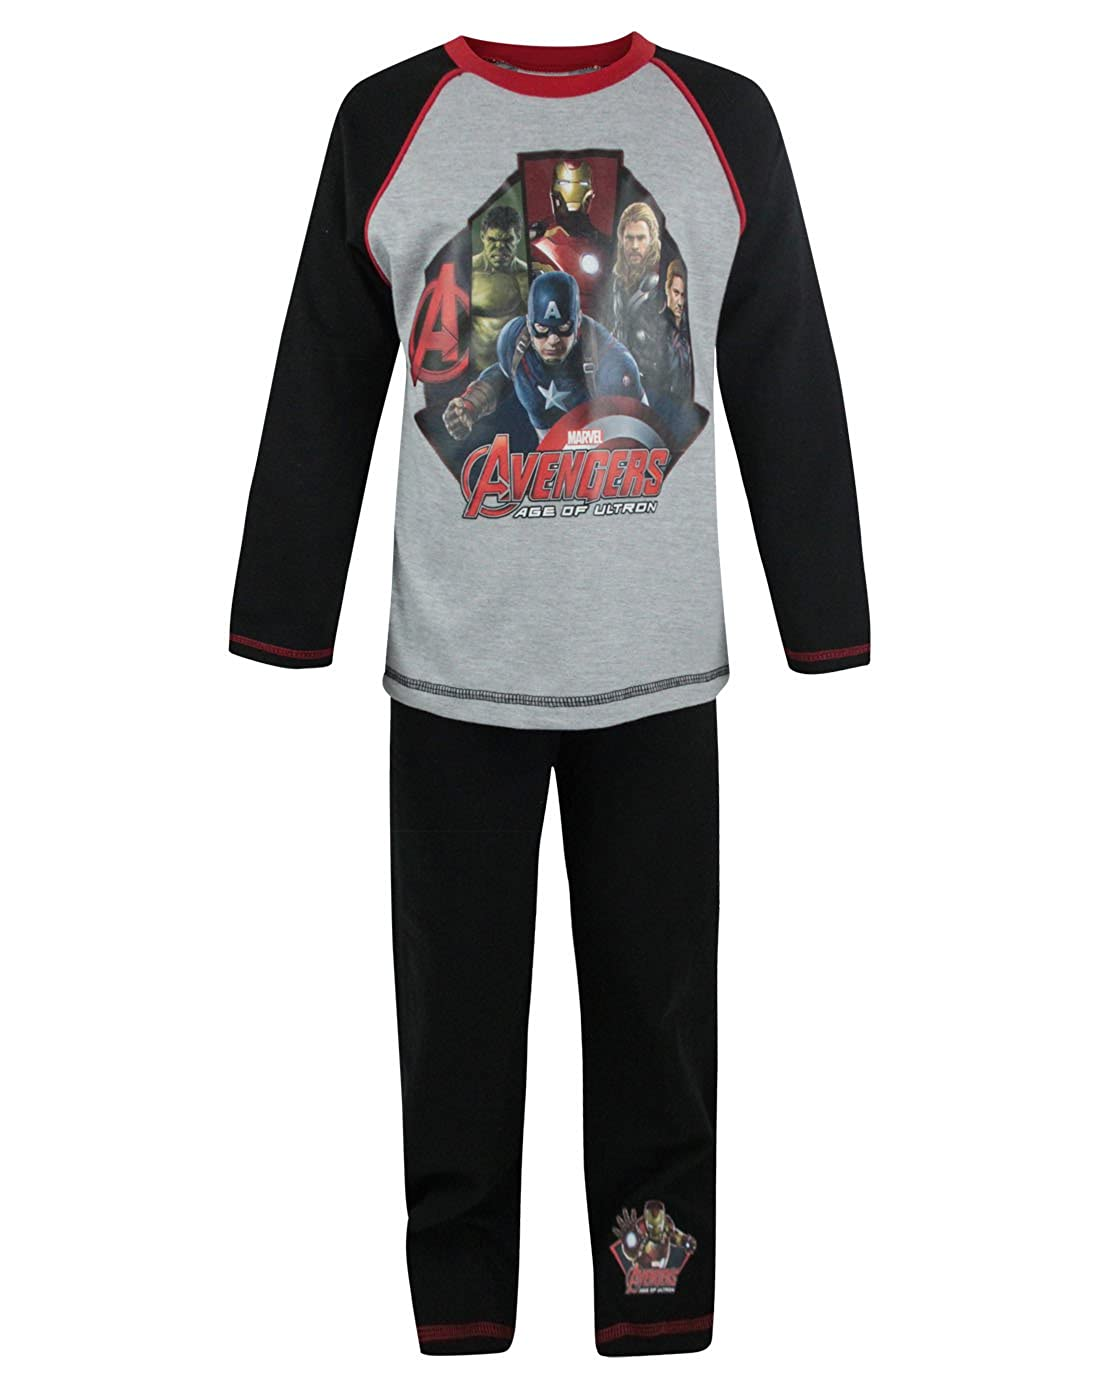 Official Avengers Age Of Ultron Boy's Pyjamas